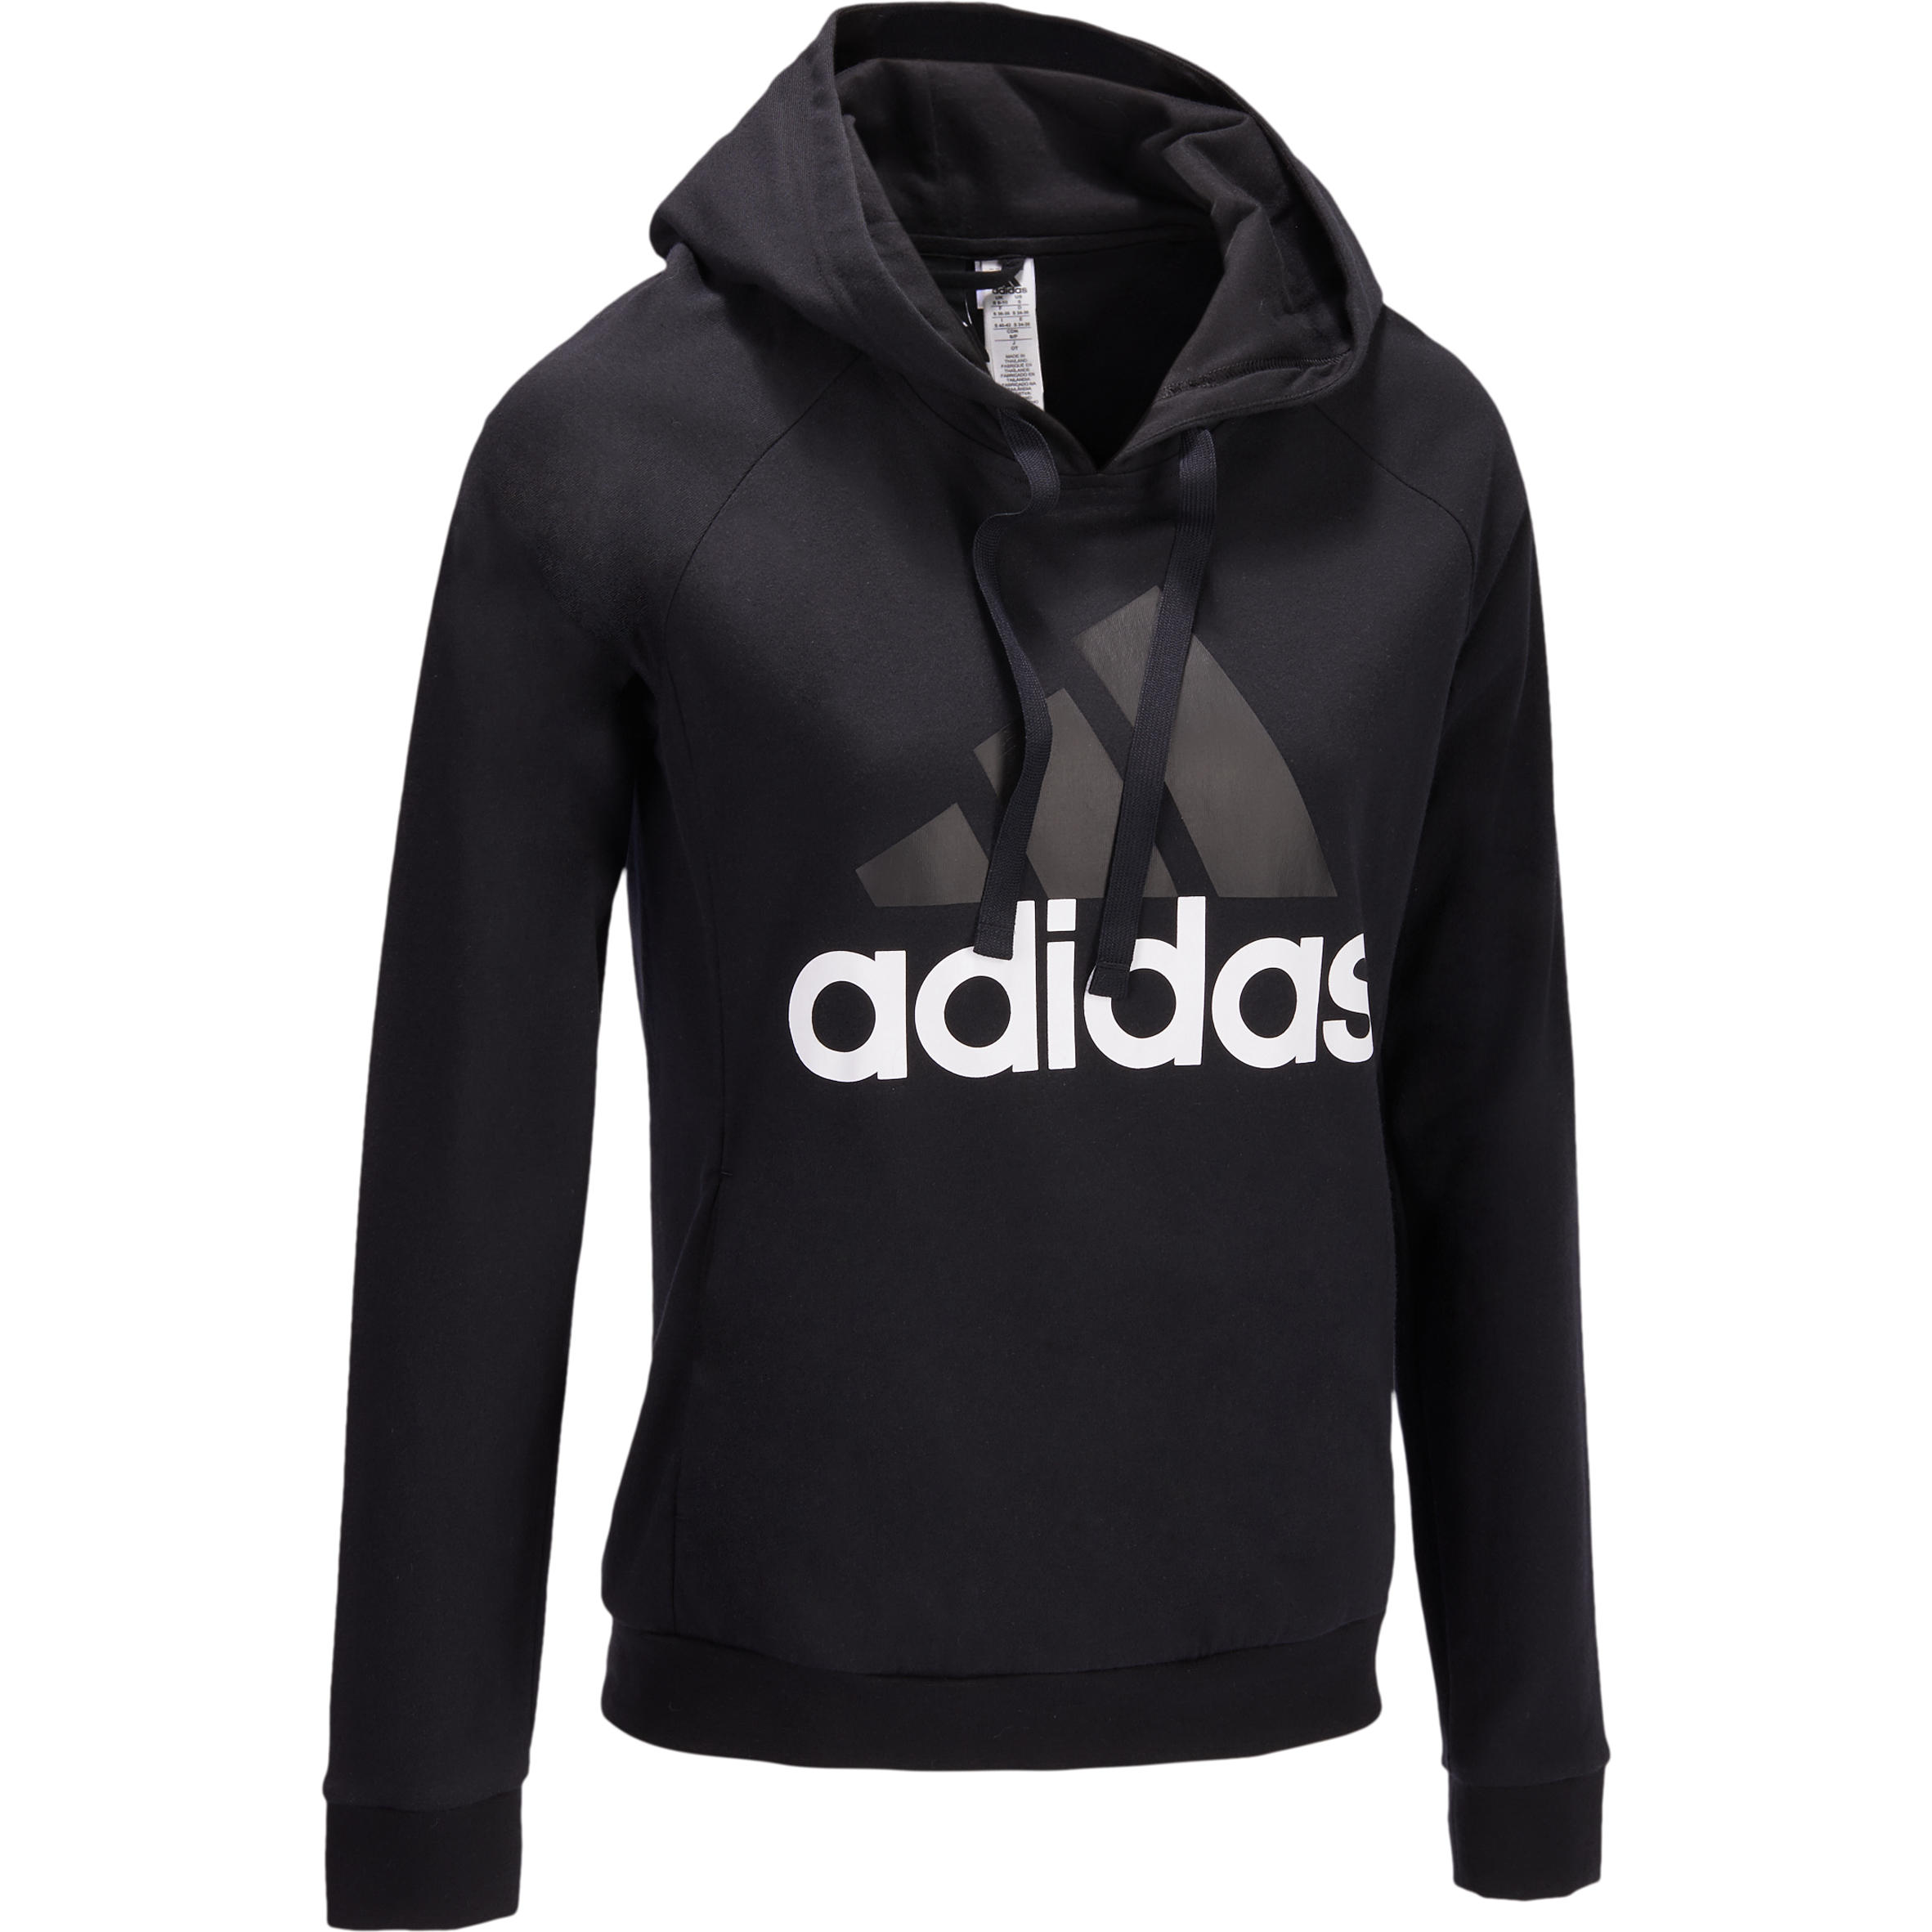 Adidas Dameshoodie Adidas voor gym en pilates logo